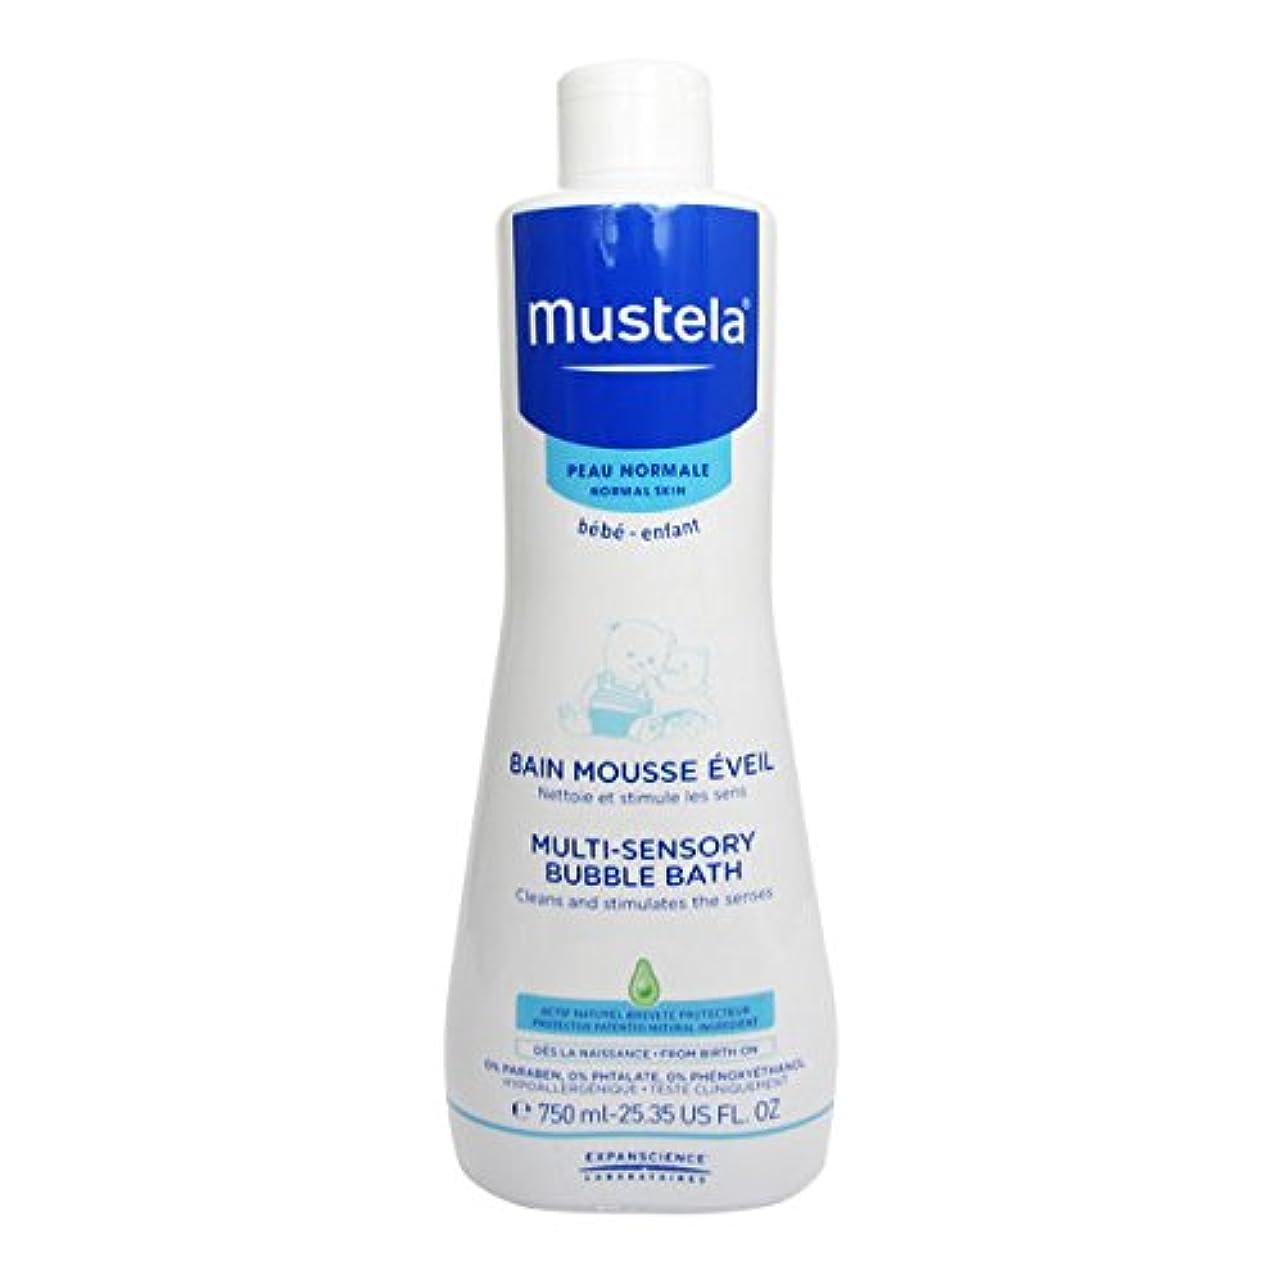 Mustela Multi-sensory Bubble Bath 750ml [並行輸入品]